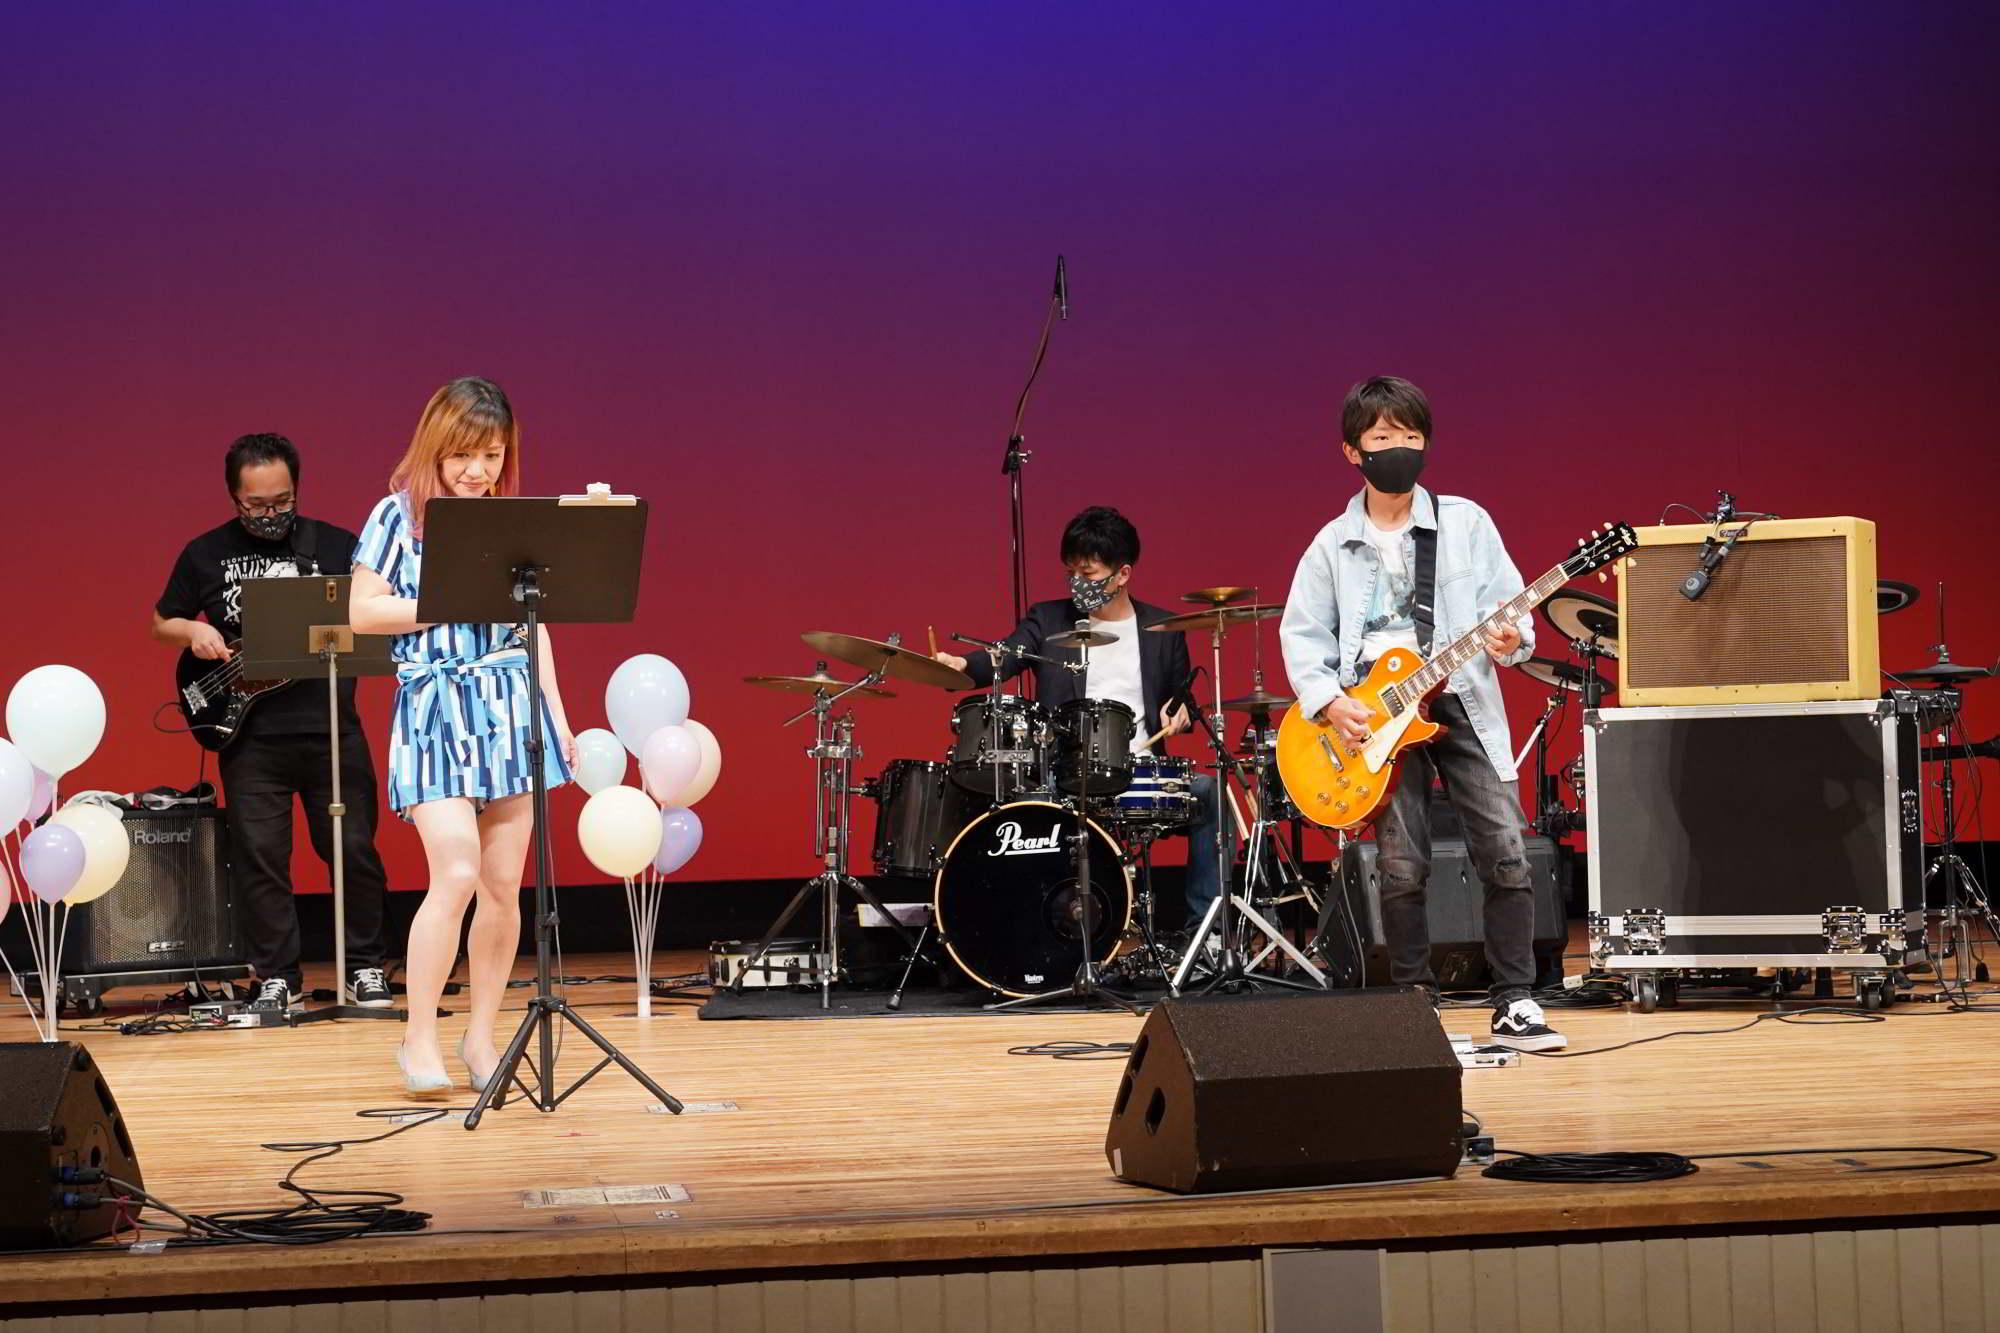 Fucciミュージックスクール発表会中高生一般の演奏ステージ